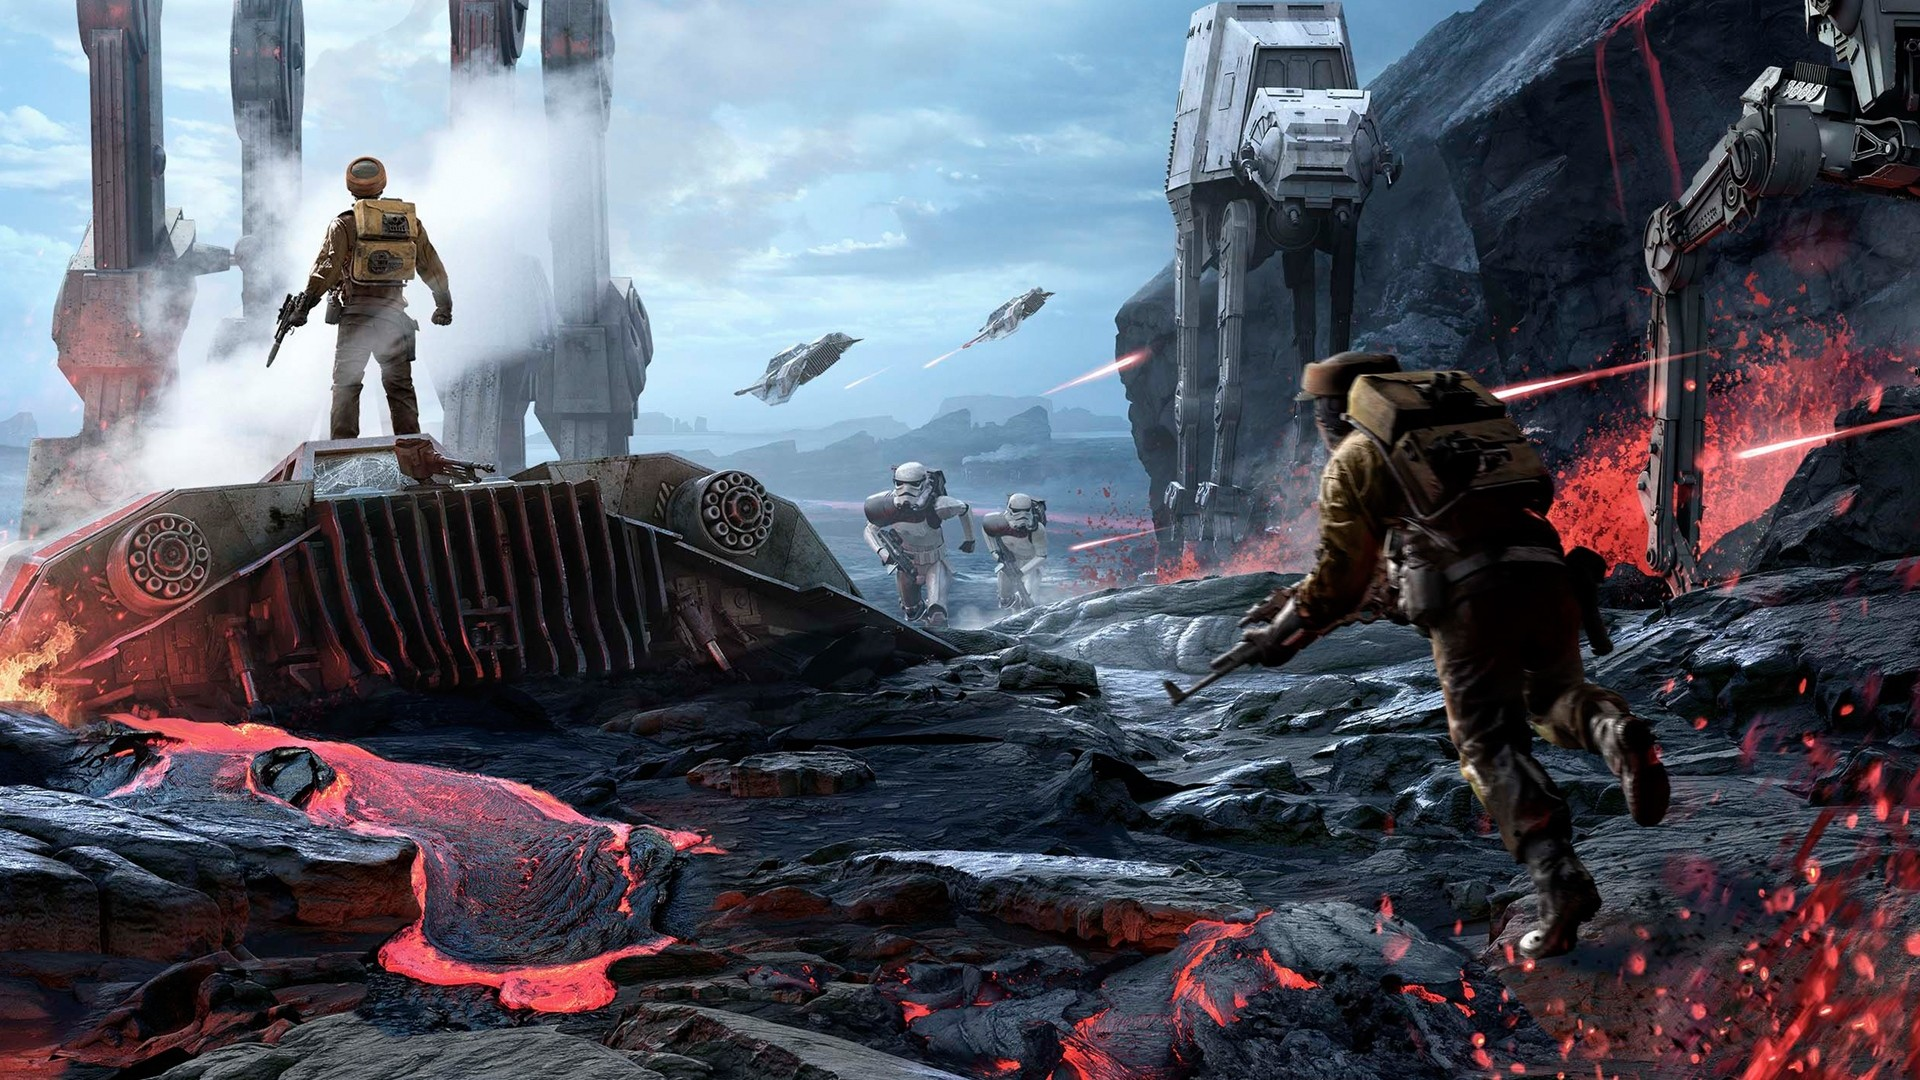 Star Wars Battlefront Wallpapers 1080p 82 Images